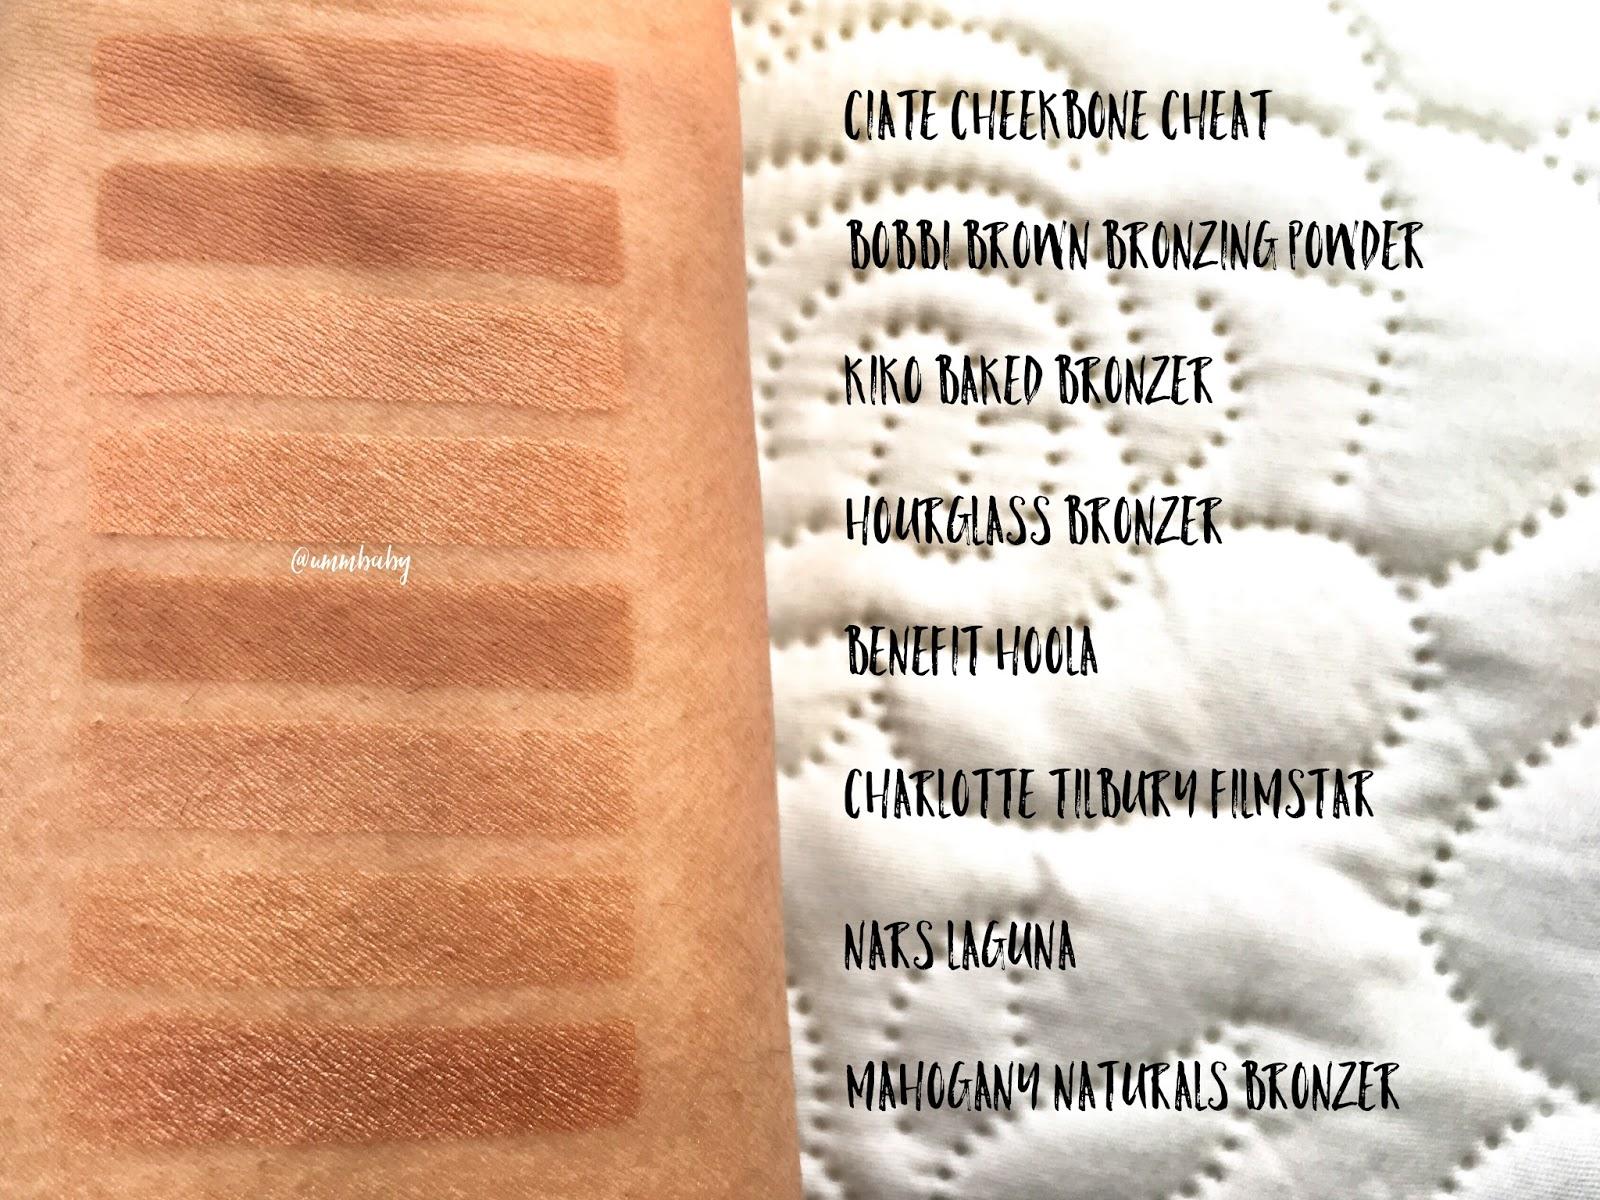 bronzer swatches on medium nc40 skin, benefit hoola swatch, bobbi brown bronzer medium swatch, charlotte tilbury filmstar bronzer swatch on medium asian indian deep skin, hourglass luminous bronze light swatch, nars laguna swatch